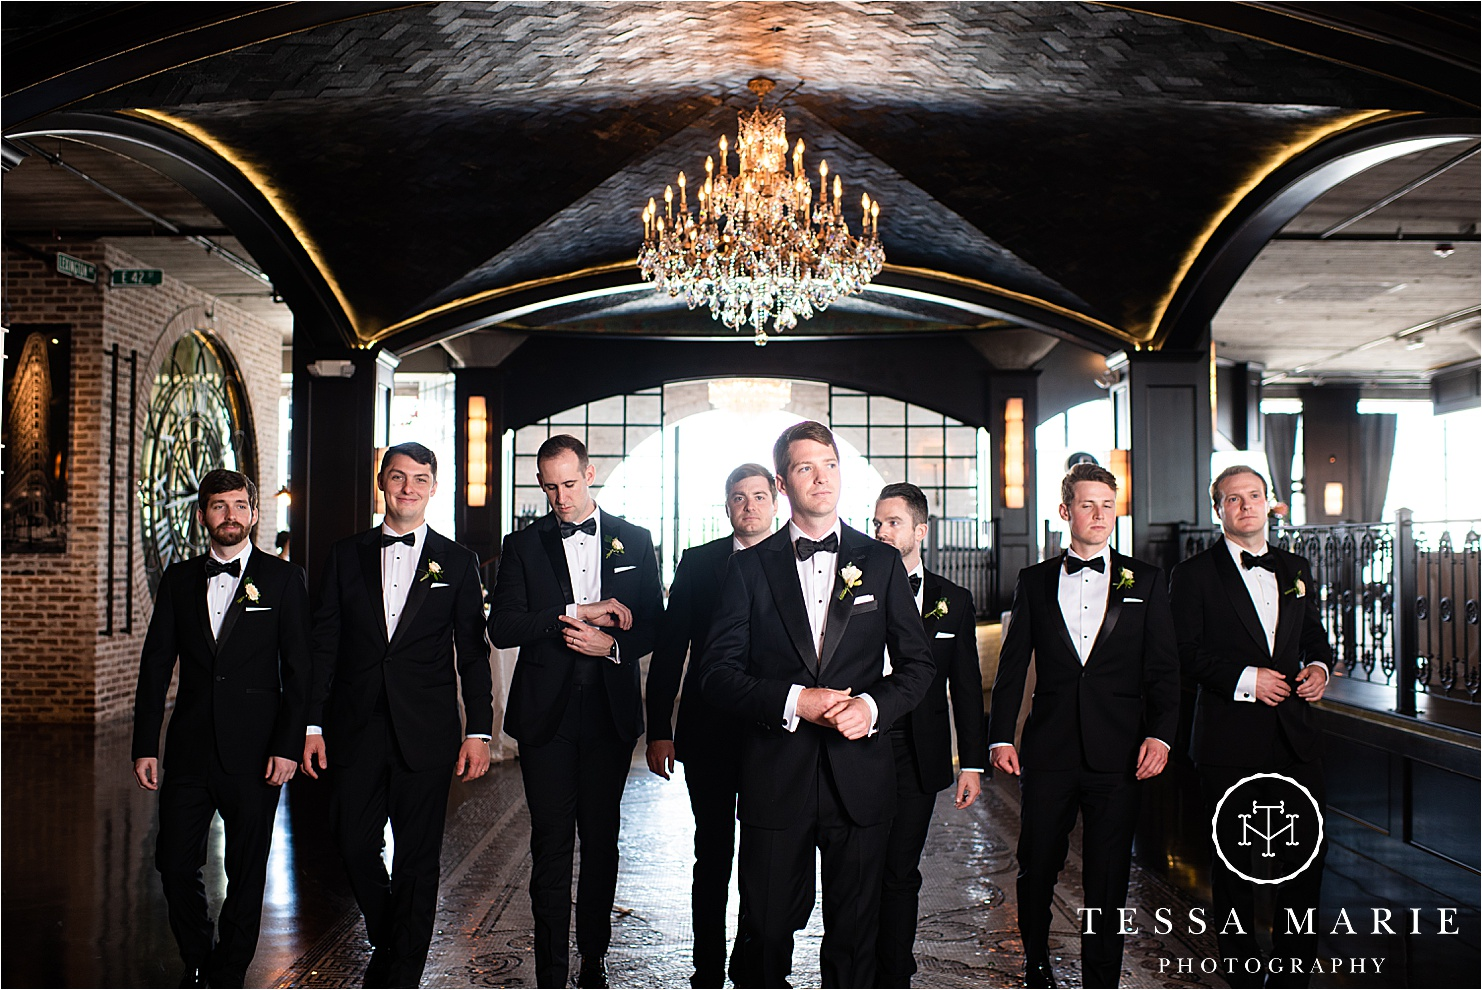 Tessa_marie_weddings_houston_wedding_photographer_The_astorian_0083.jpg